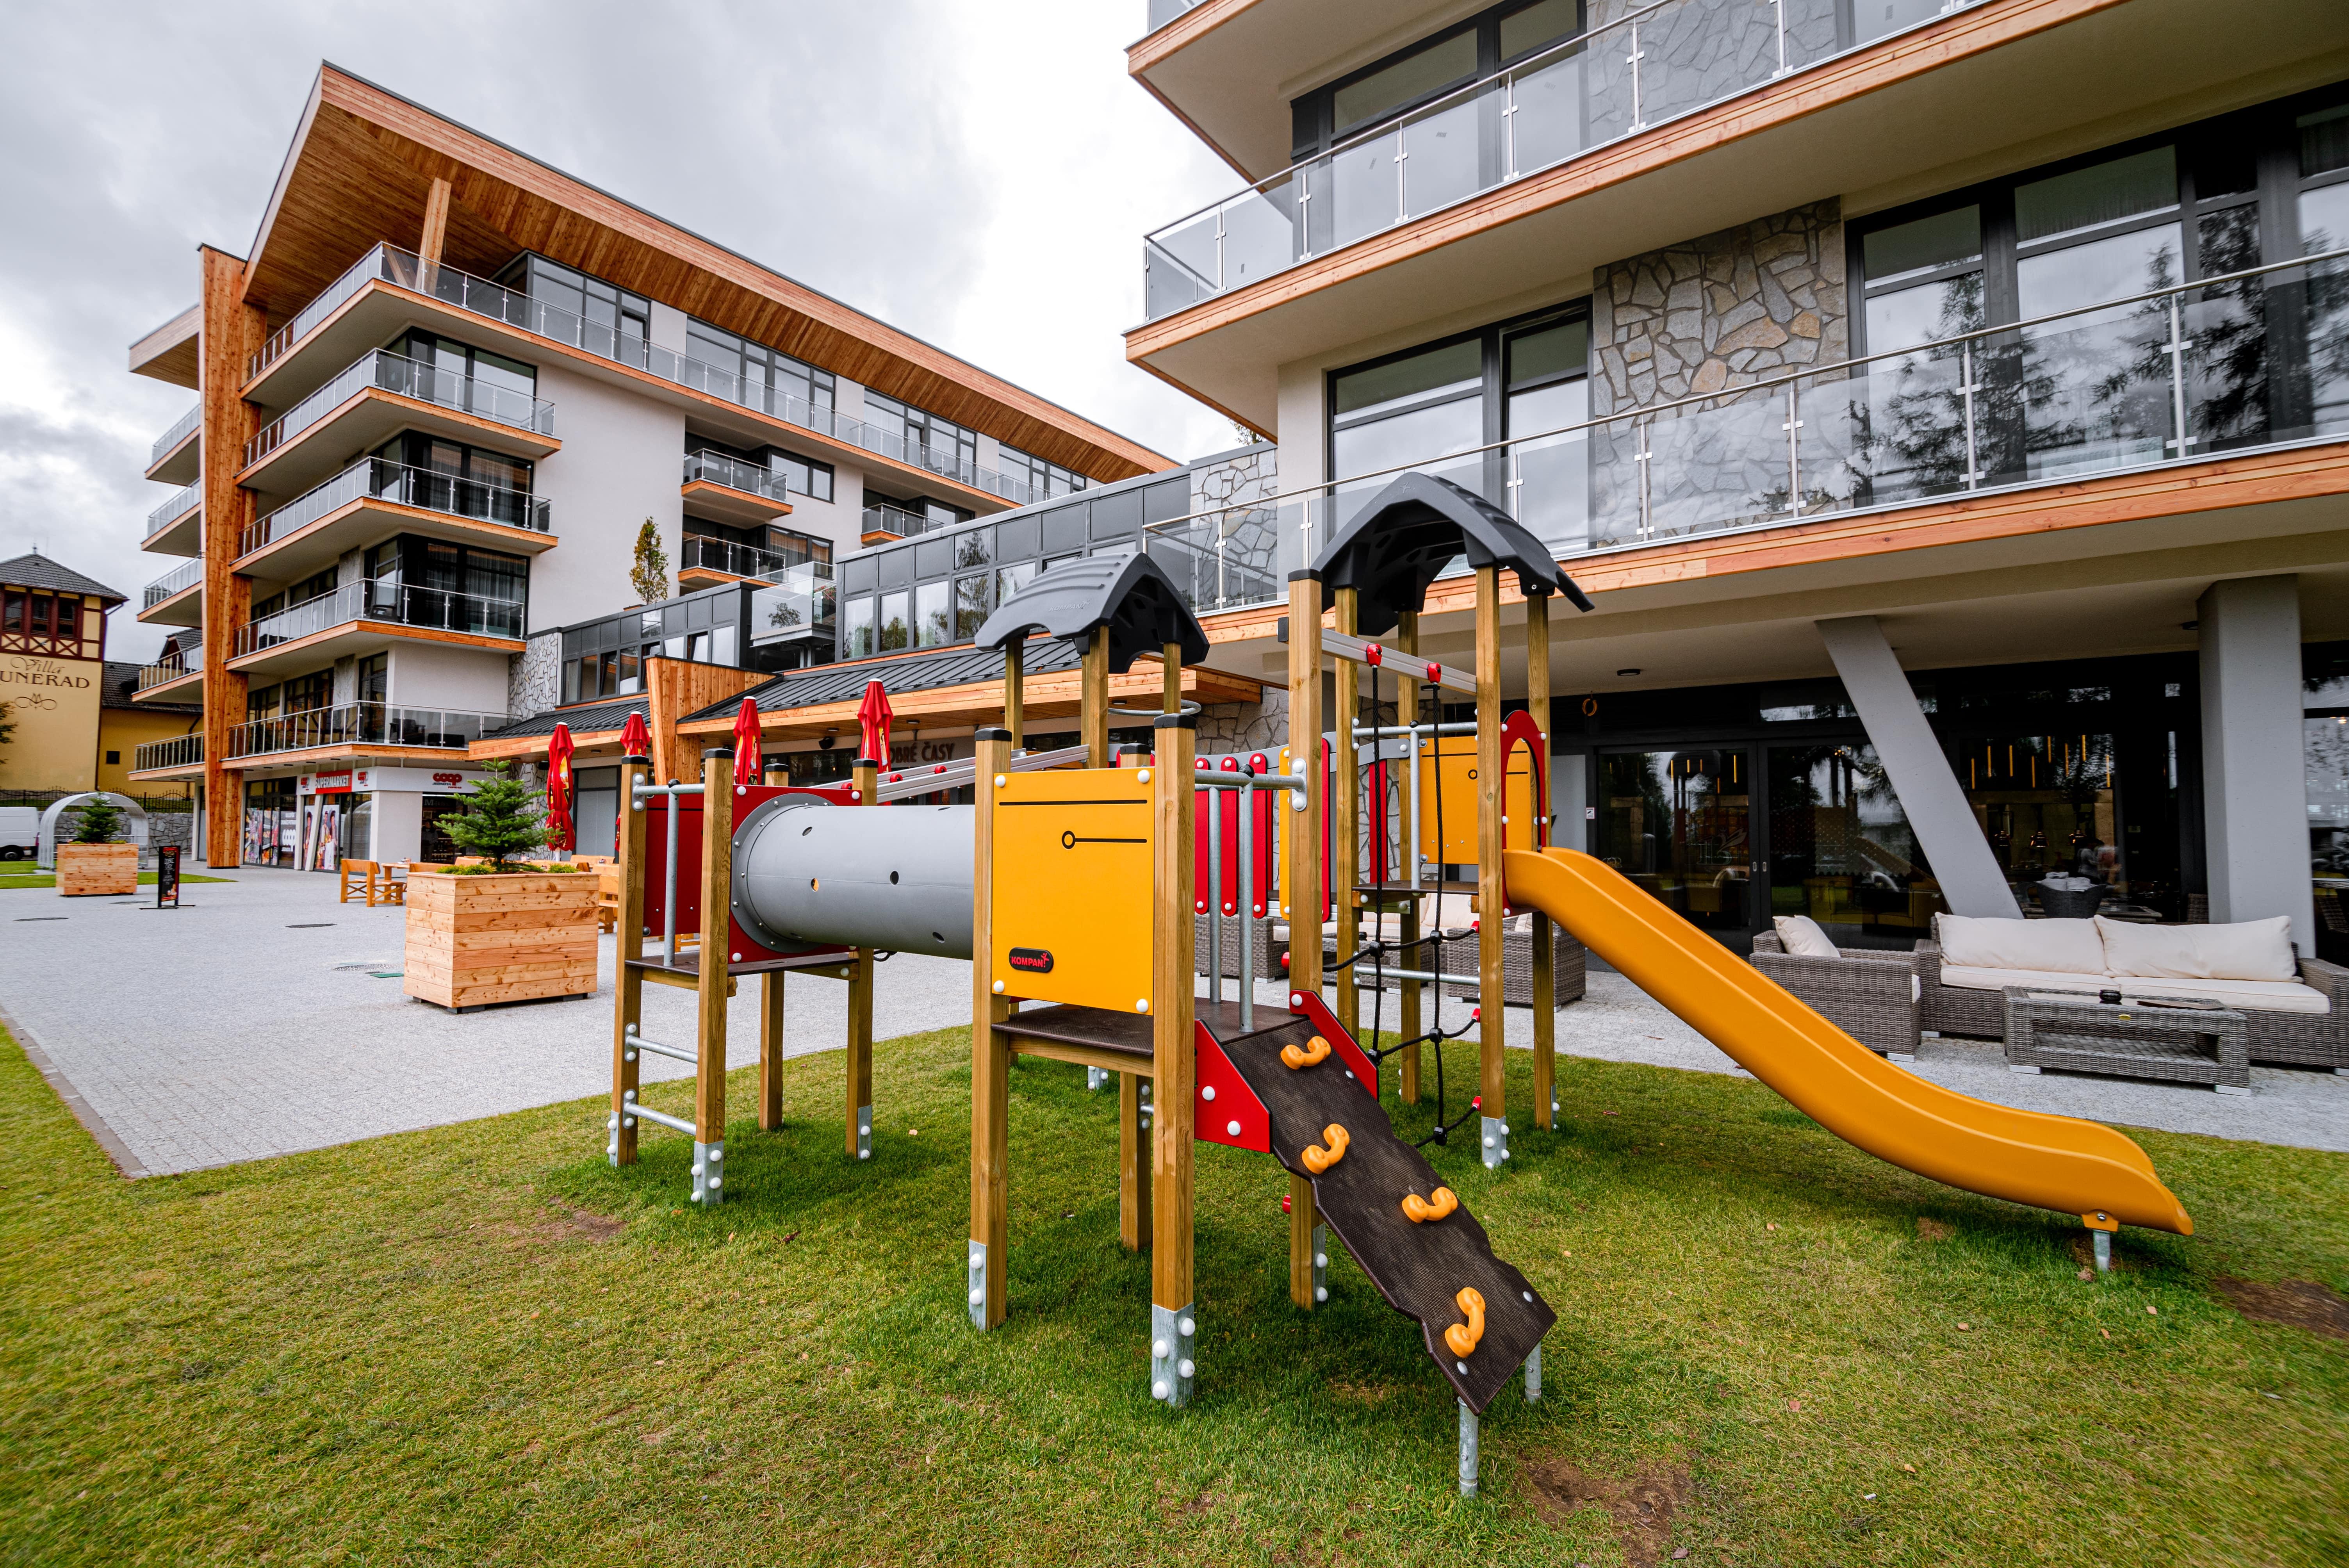 Hrebienok Hotel Resort zo spodu